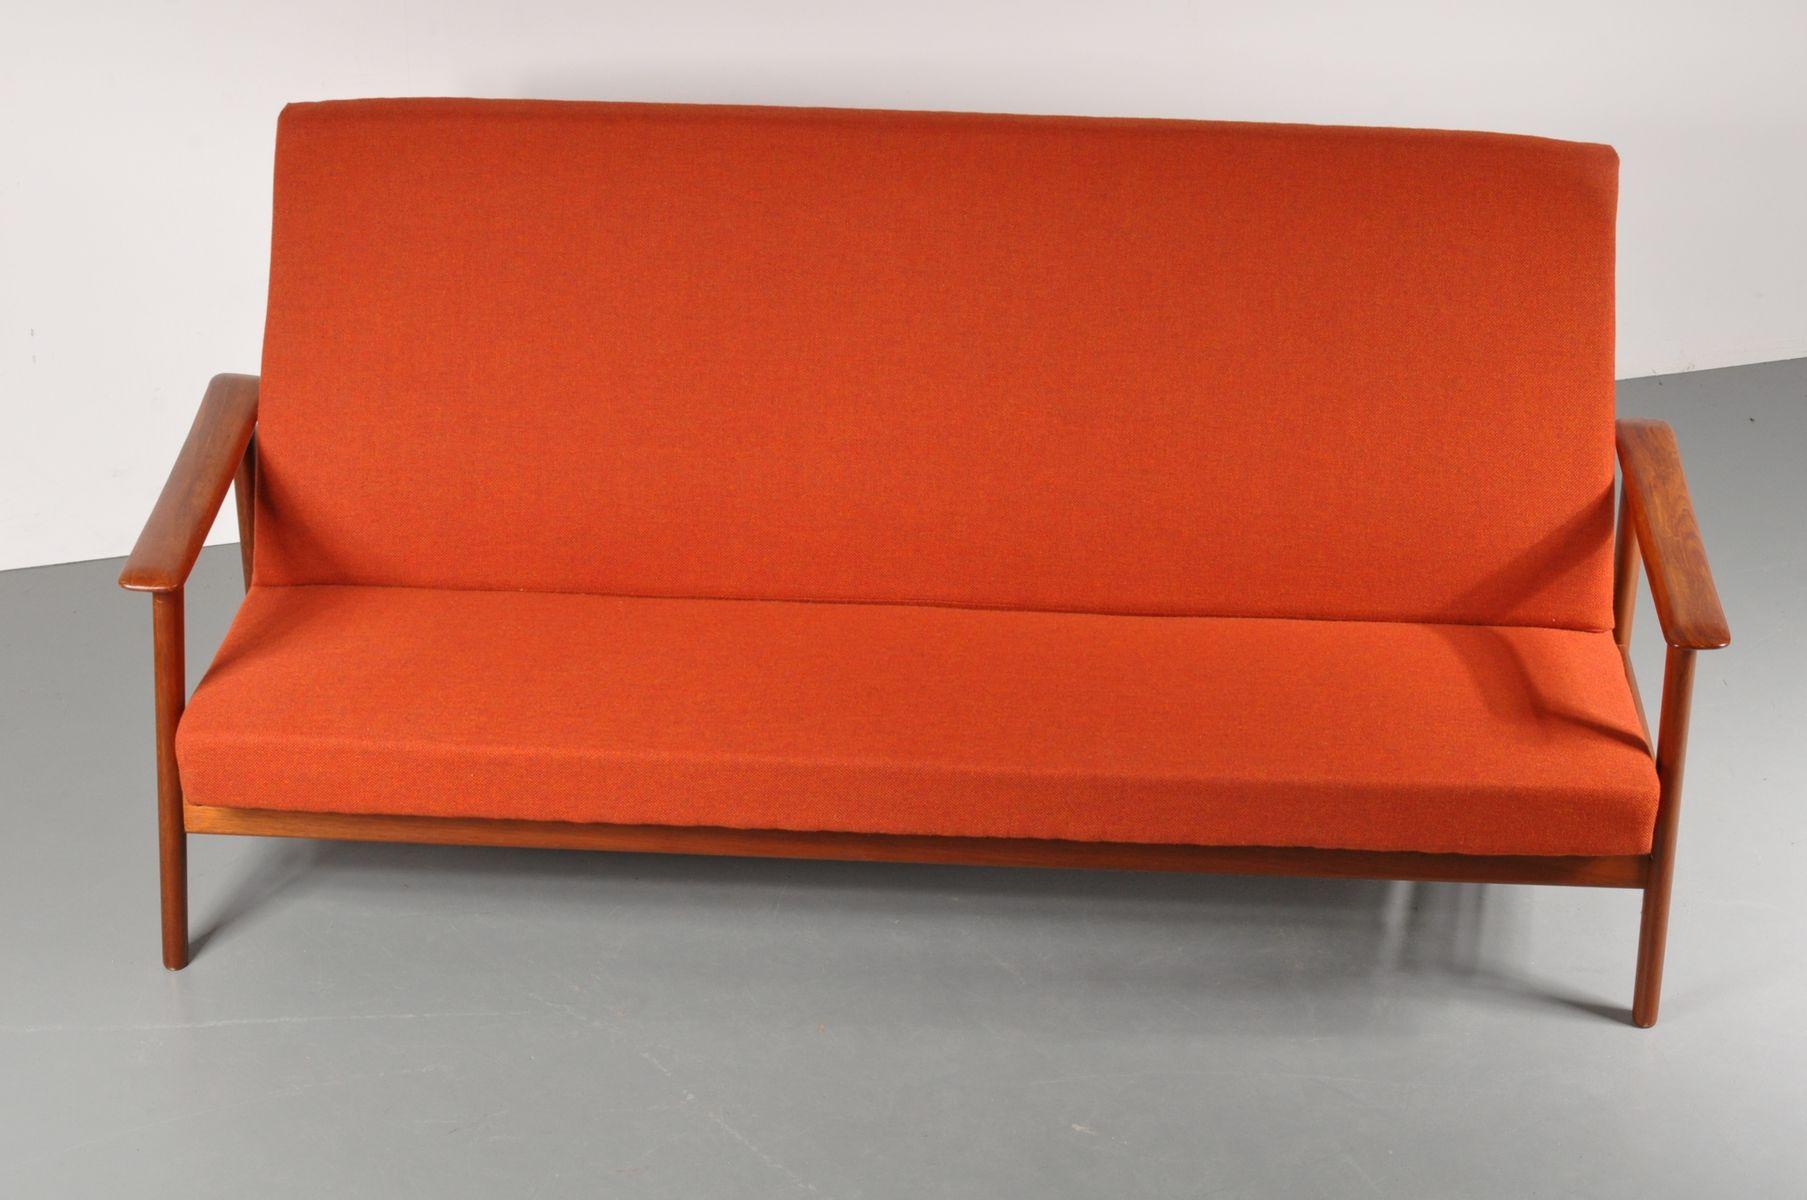 Scandinavian 3-Seater Sofa, 1950s for sale at Pamono